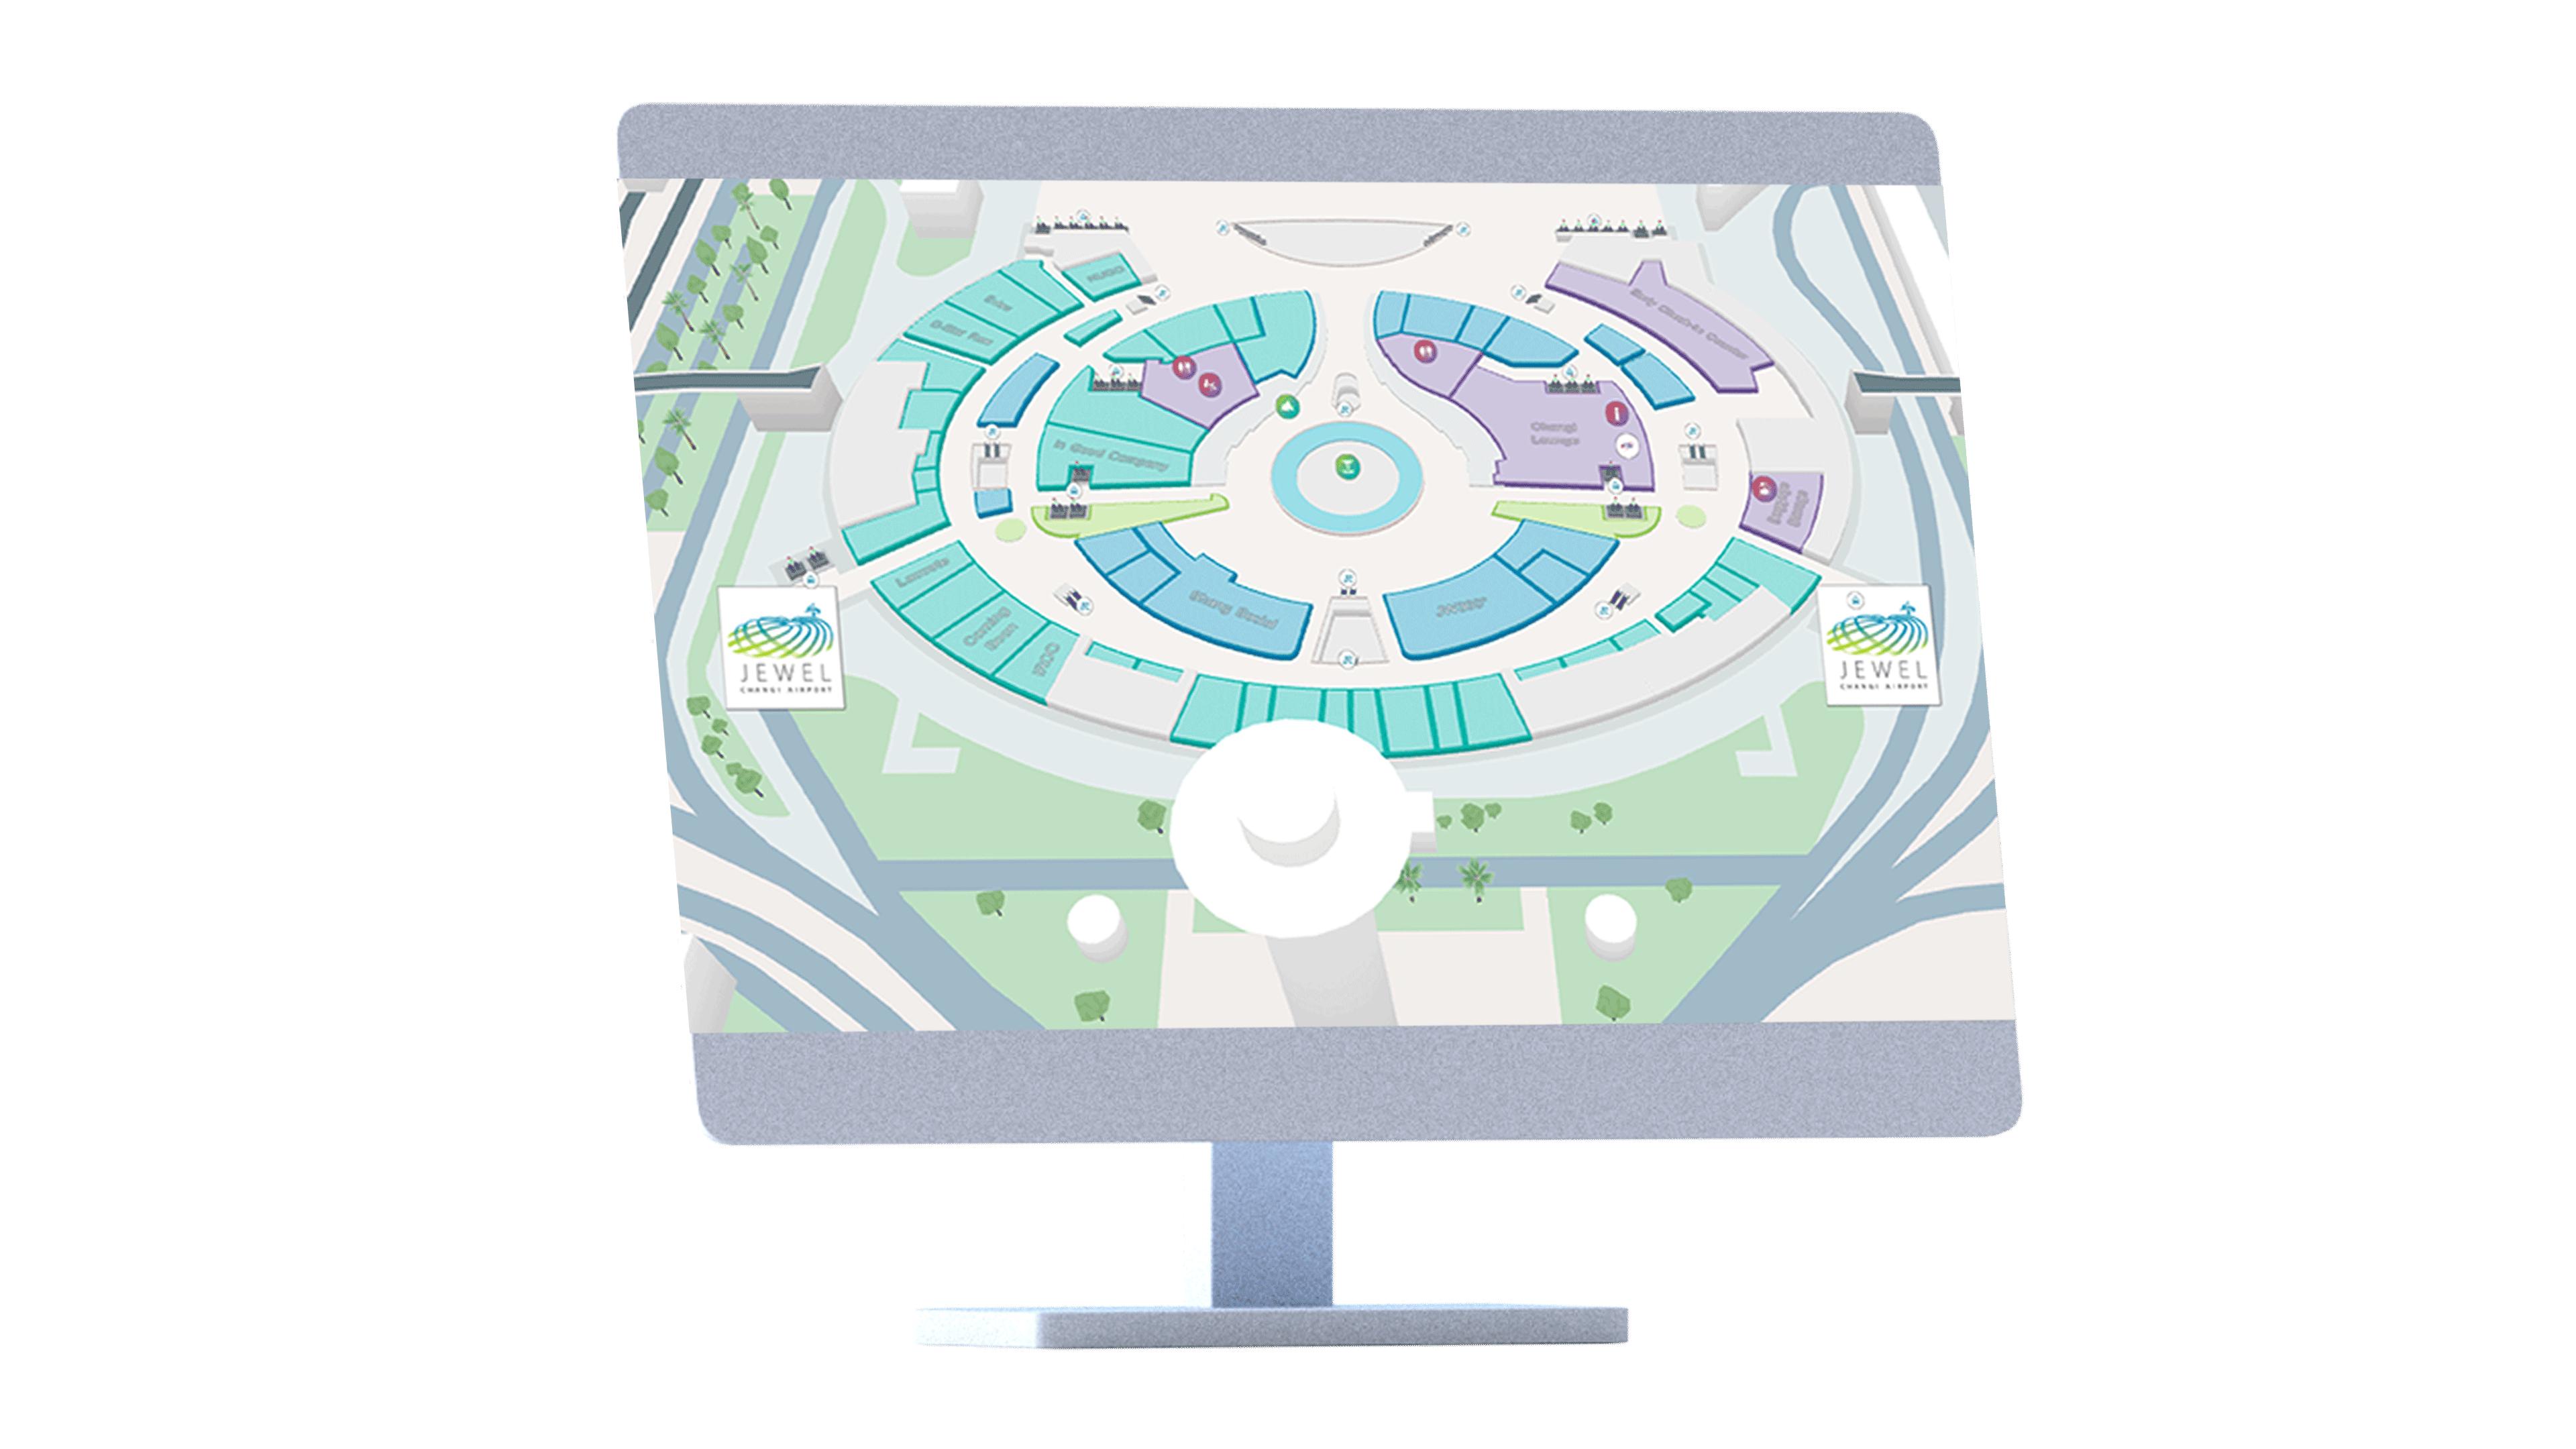 Indoor maps visualization on web